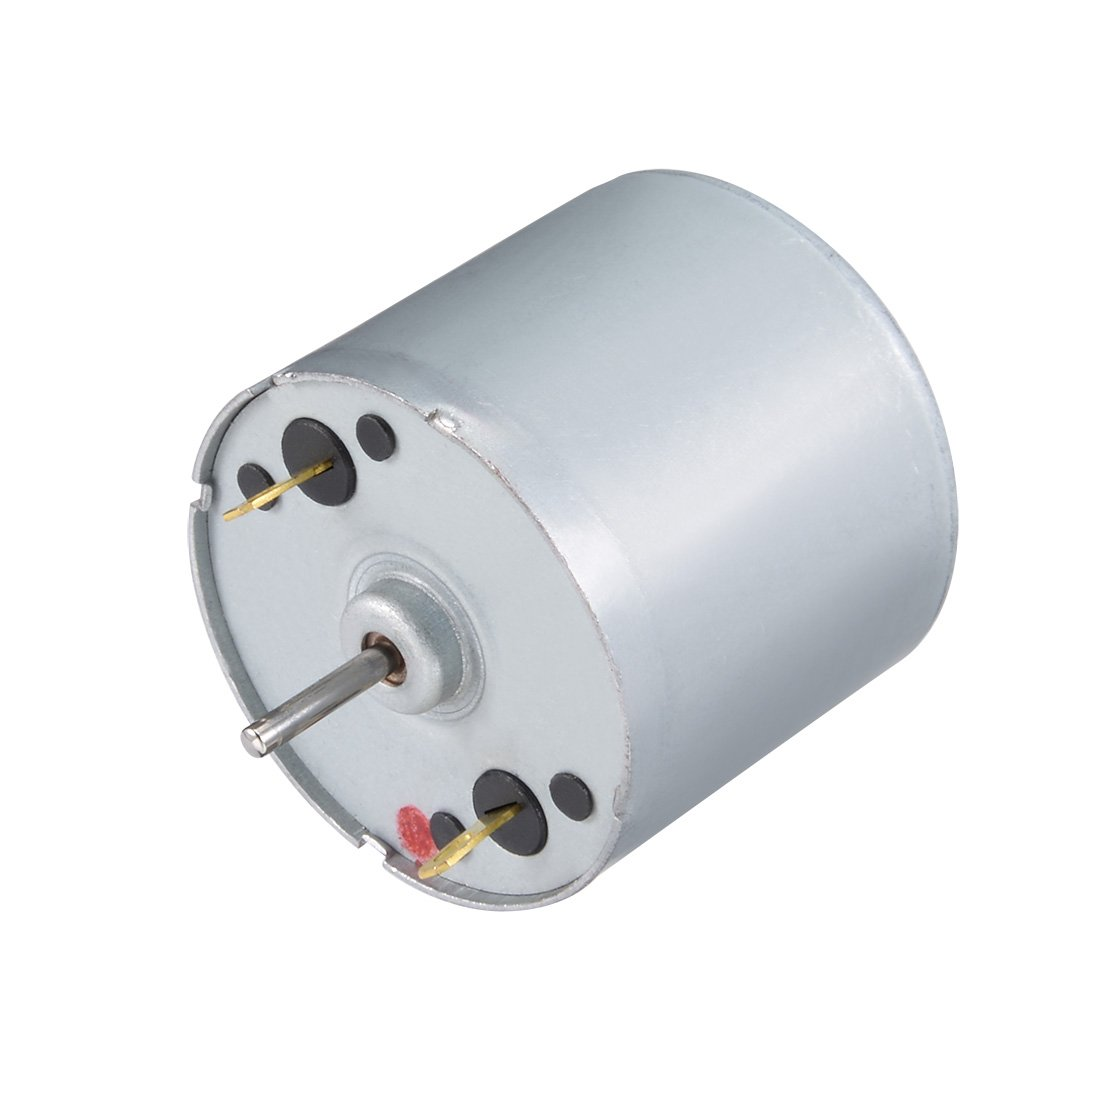 RF-500TB-12560 DC1.5-12V 2700RPM No Load Speed 32mm Diameter DC Motor